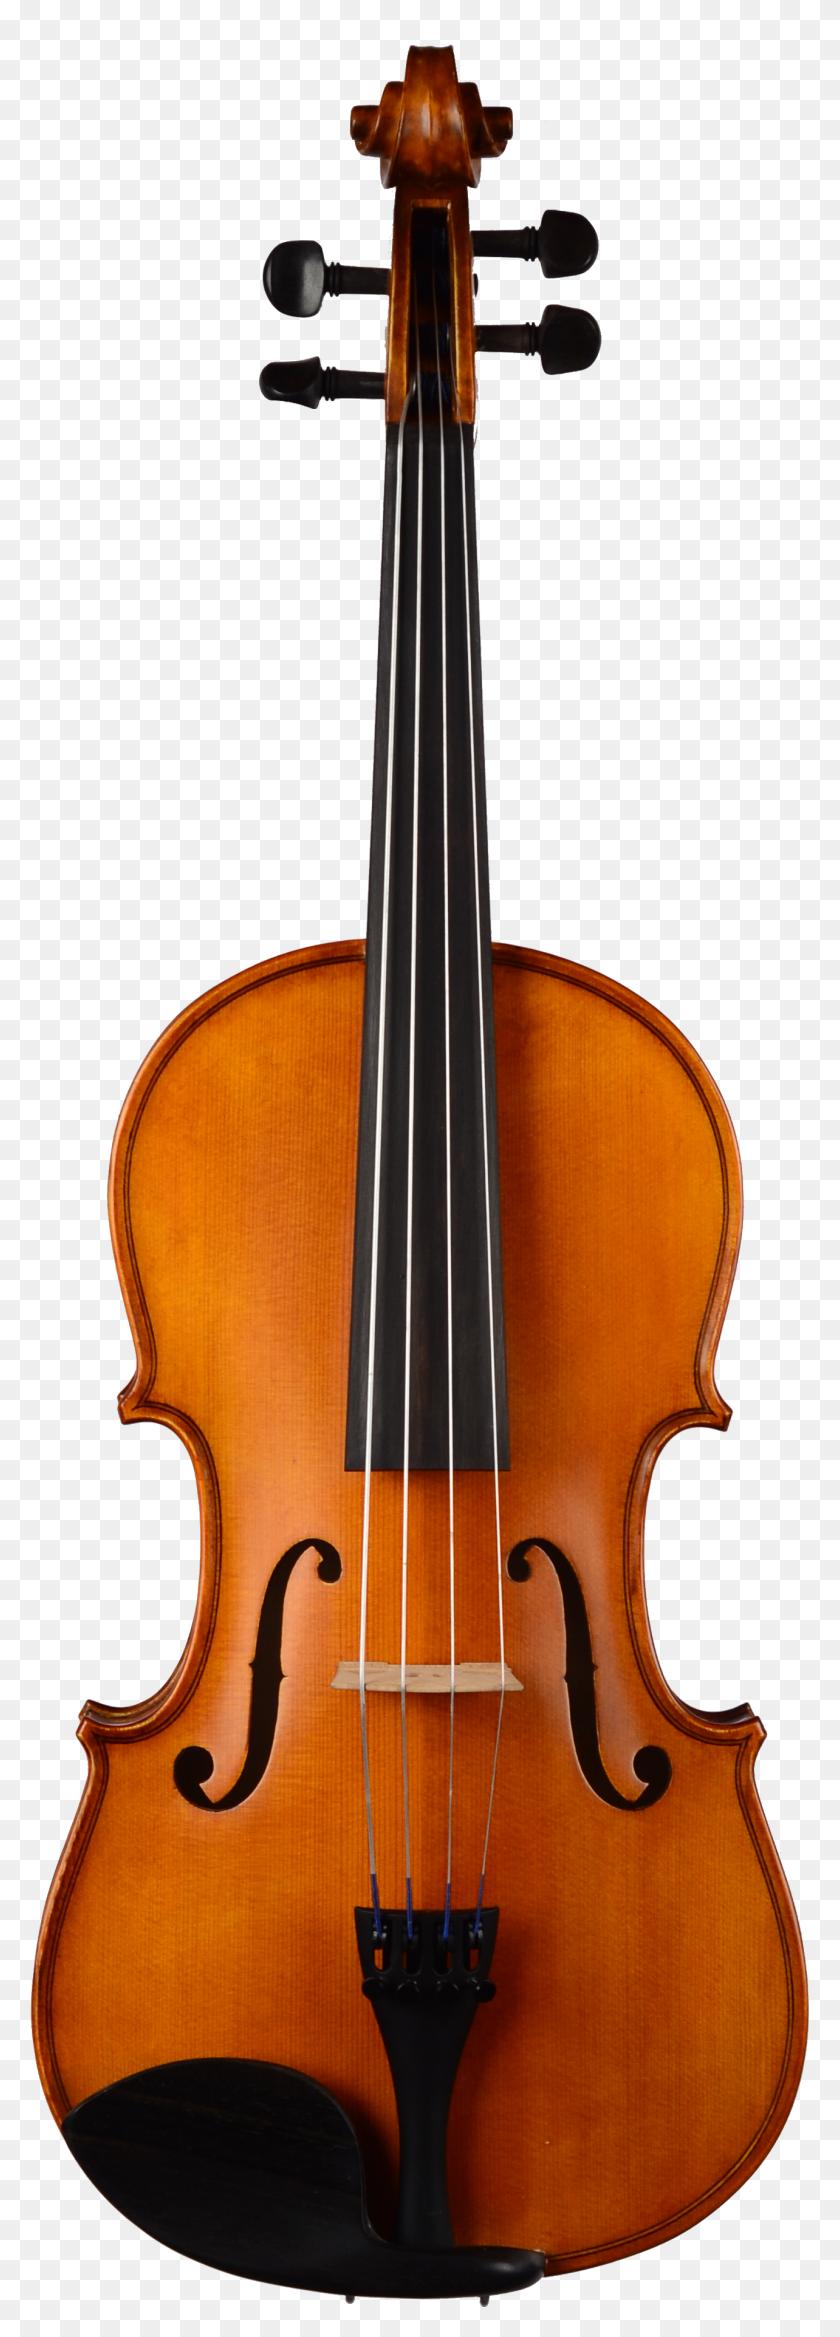 Keith, Curtis Clifton Viola Atlantic Strings - Viola PNG